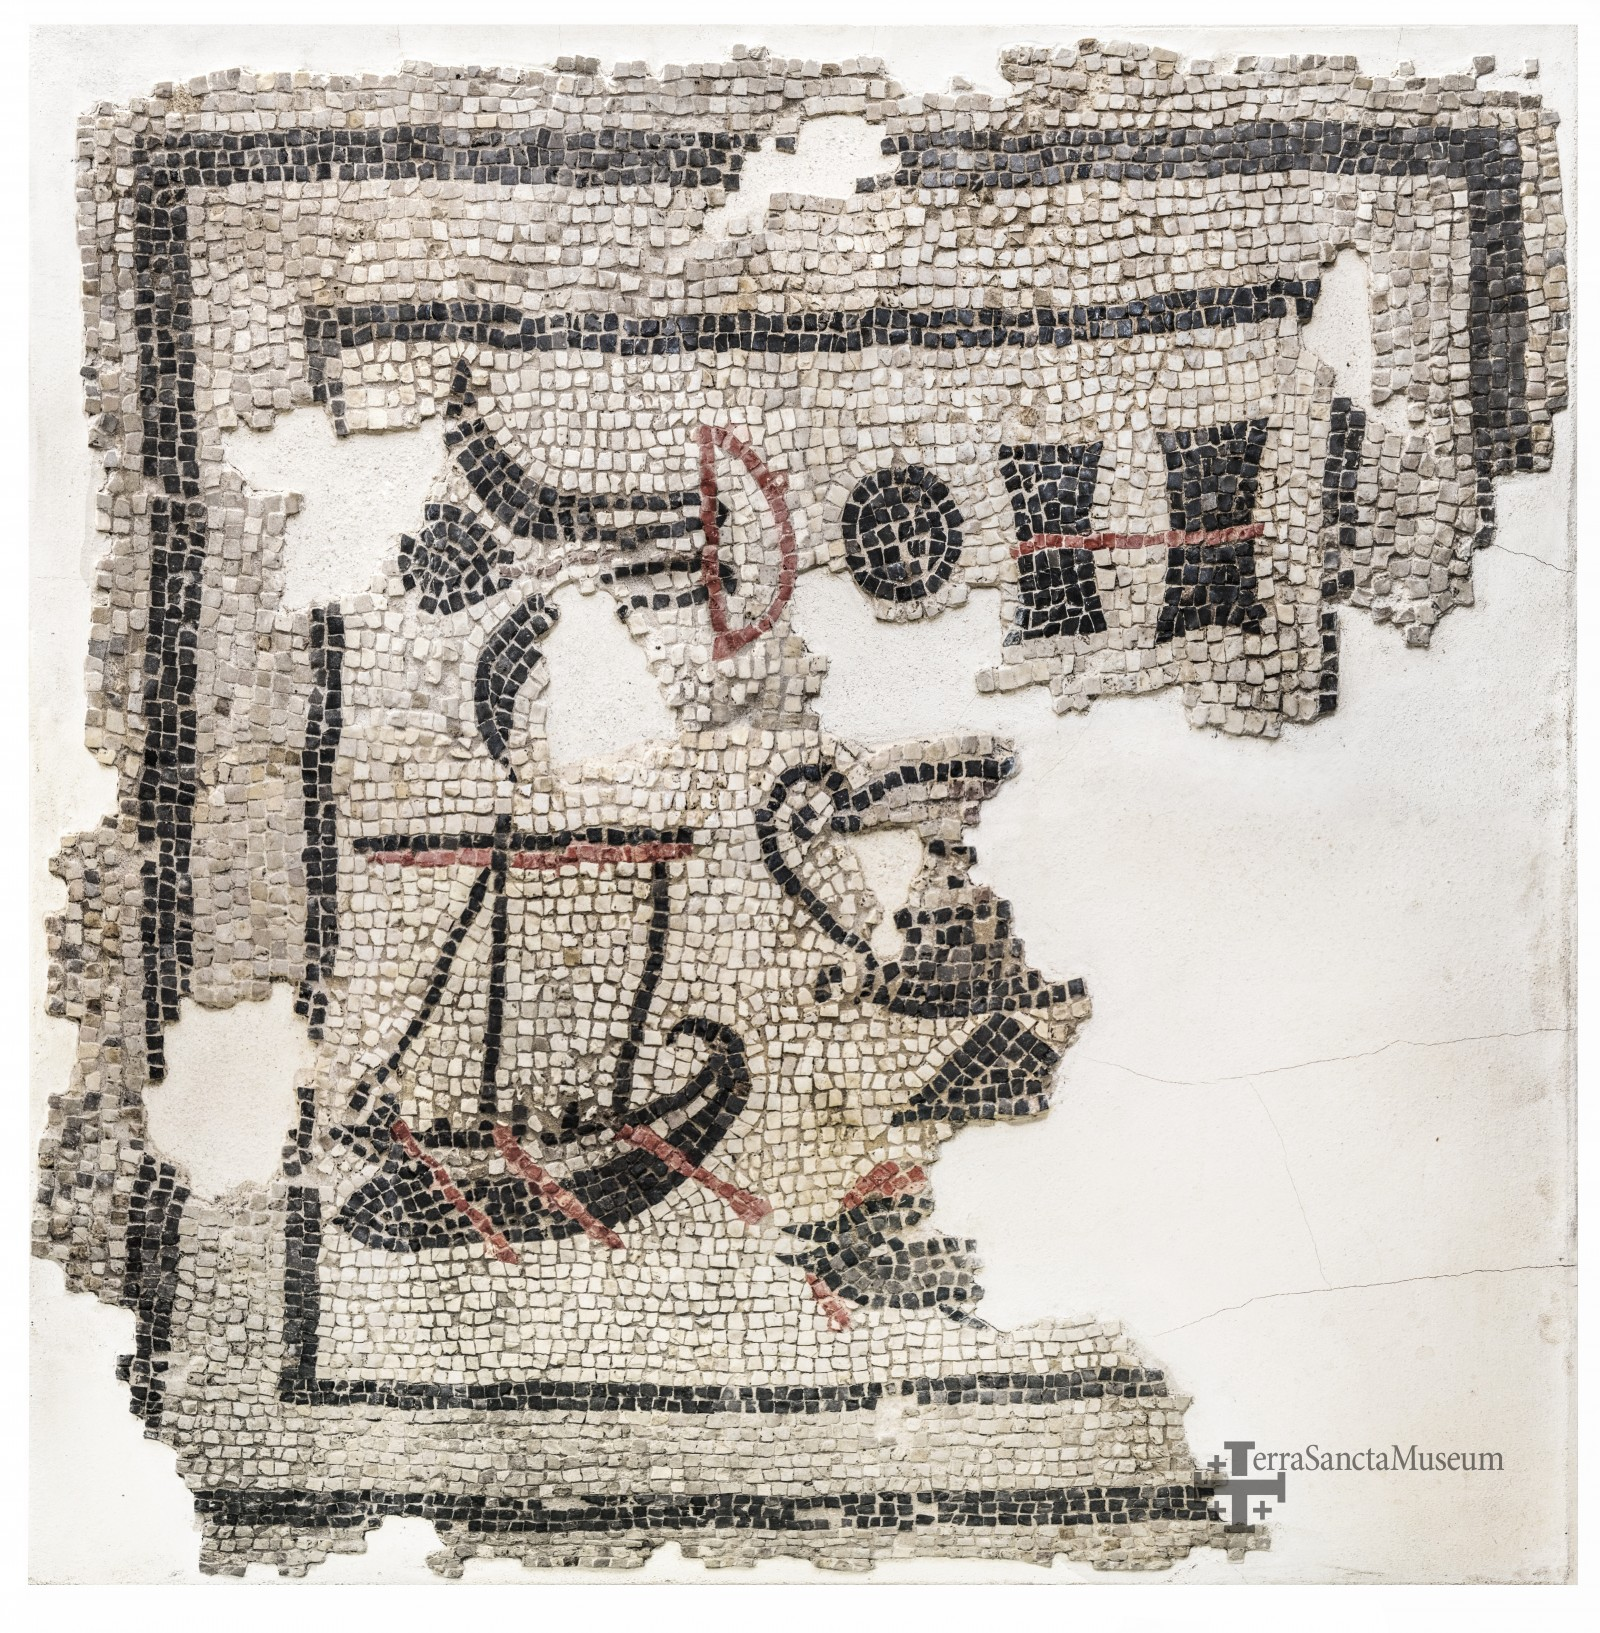 Mosaico con Barca, Magdala, siglo I